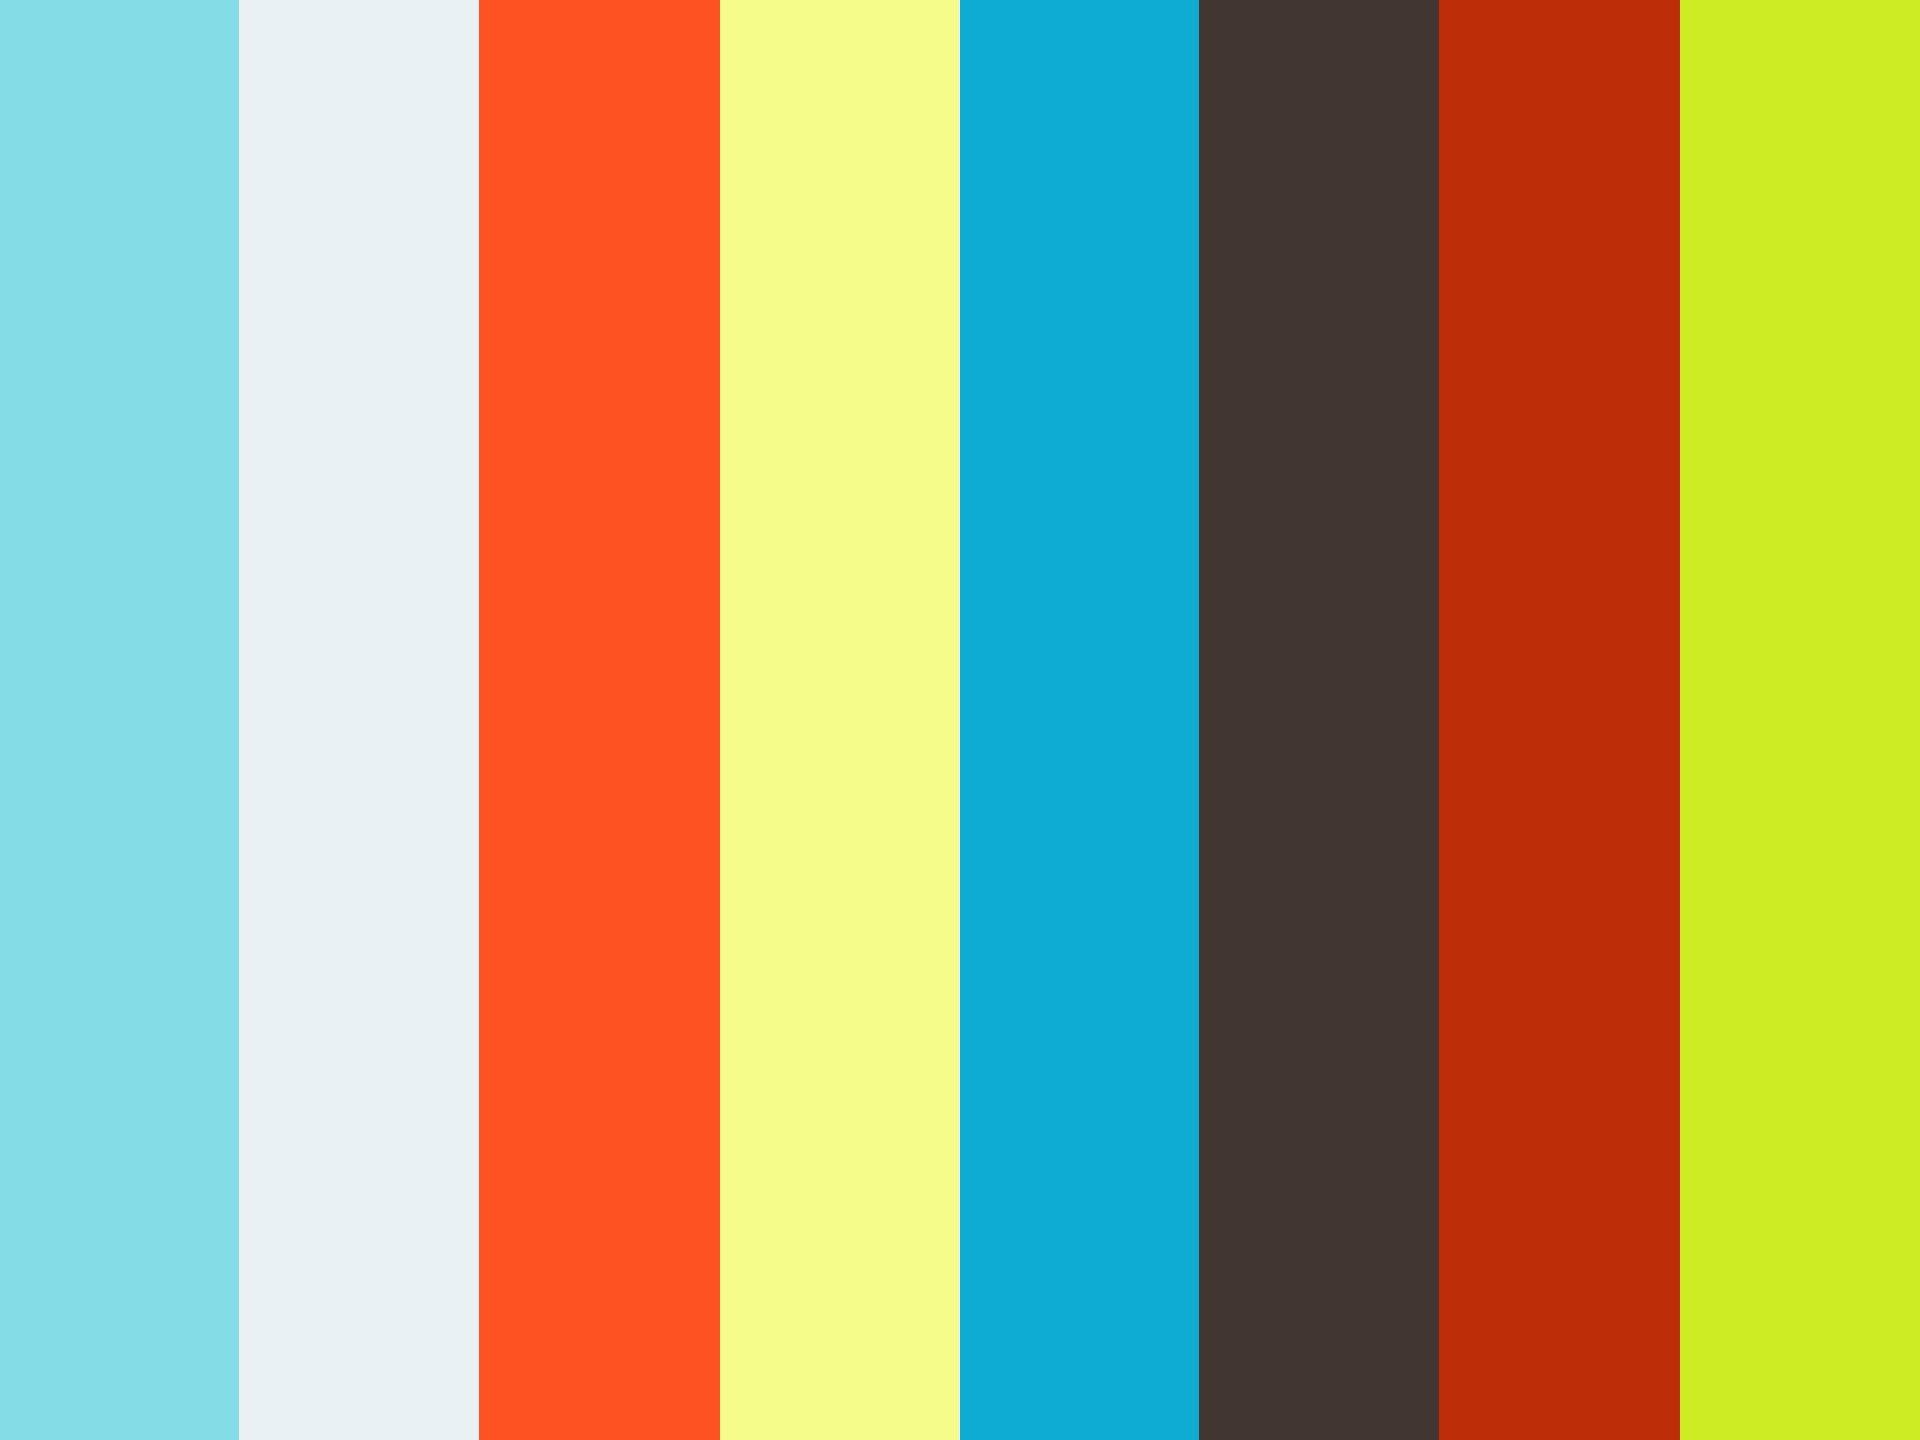 Kanye West - Wikipedia